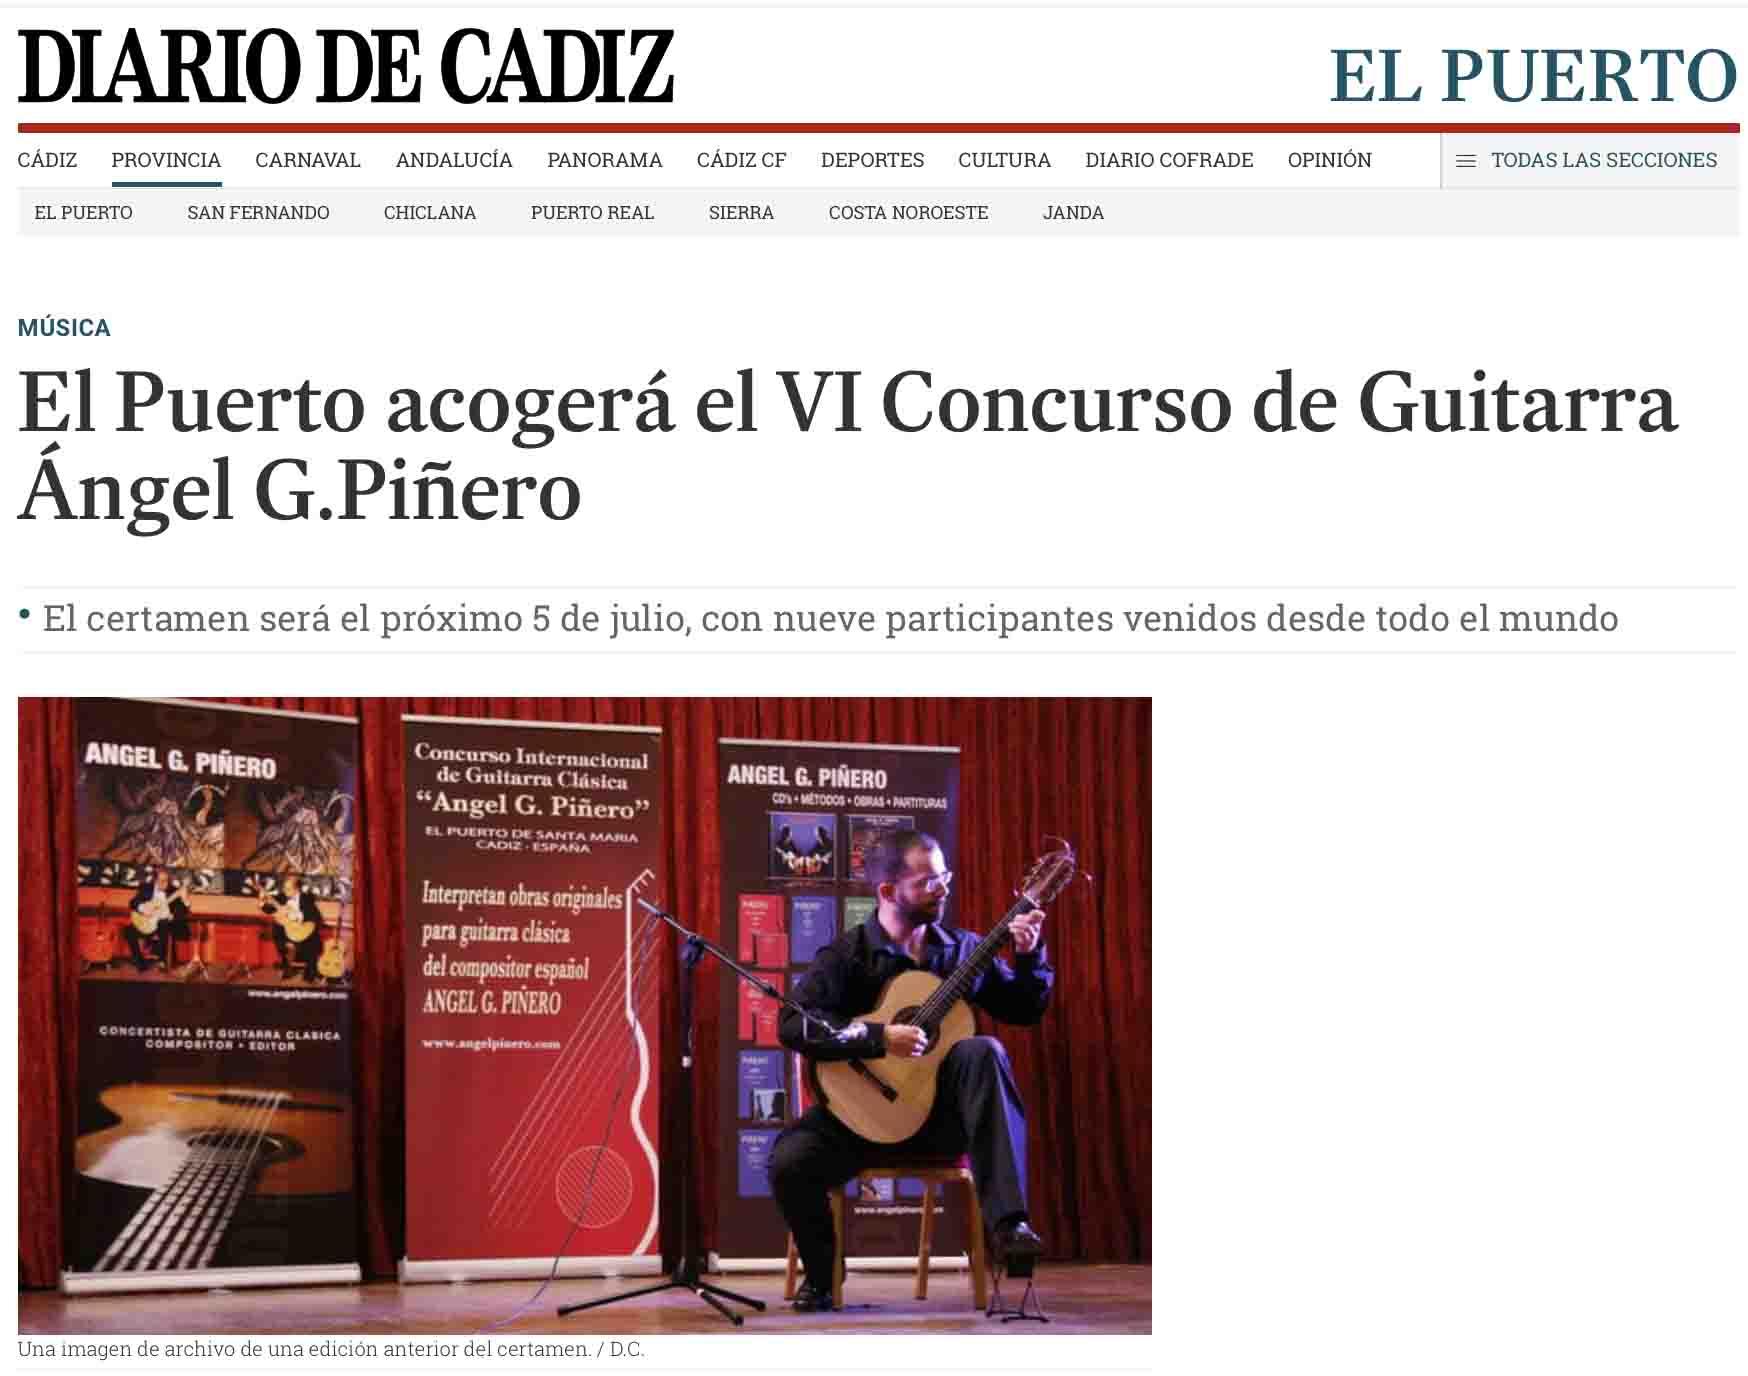 VI Concurso de Guitarra Ángel G.Piñero en Diario de Cádiz